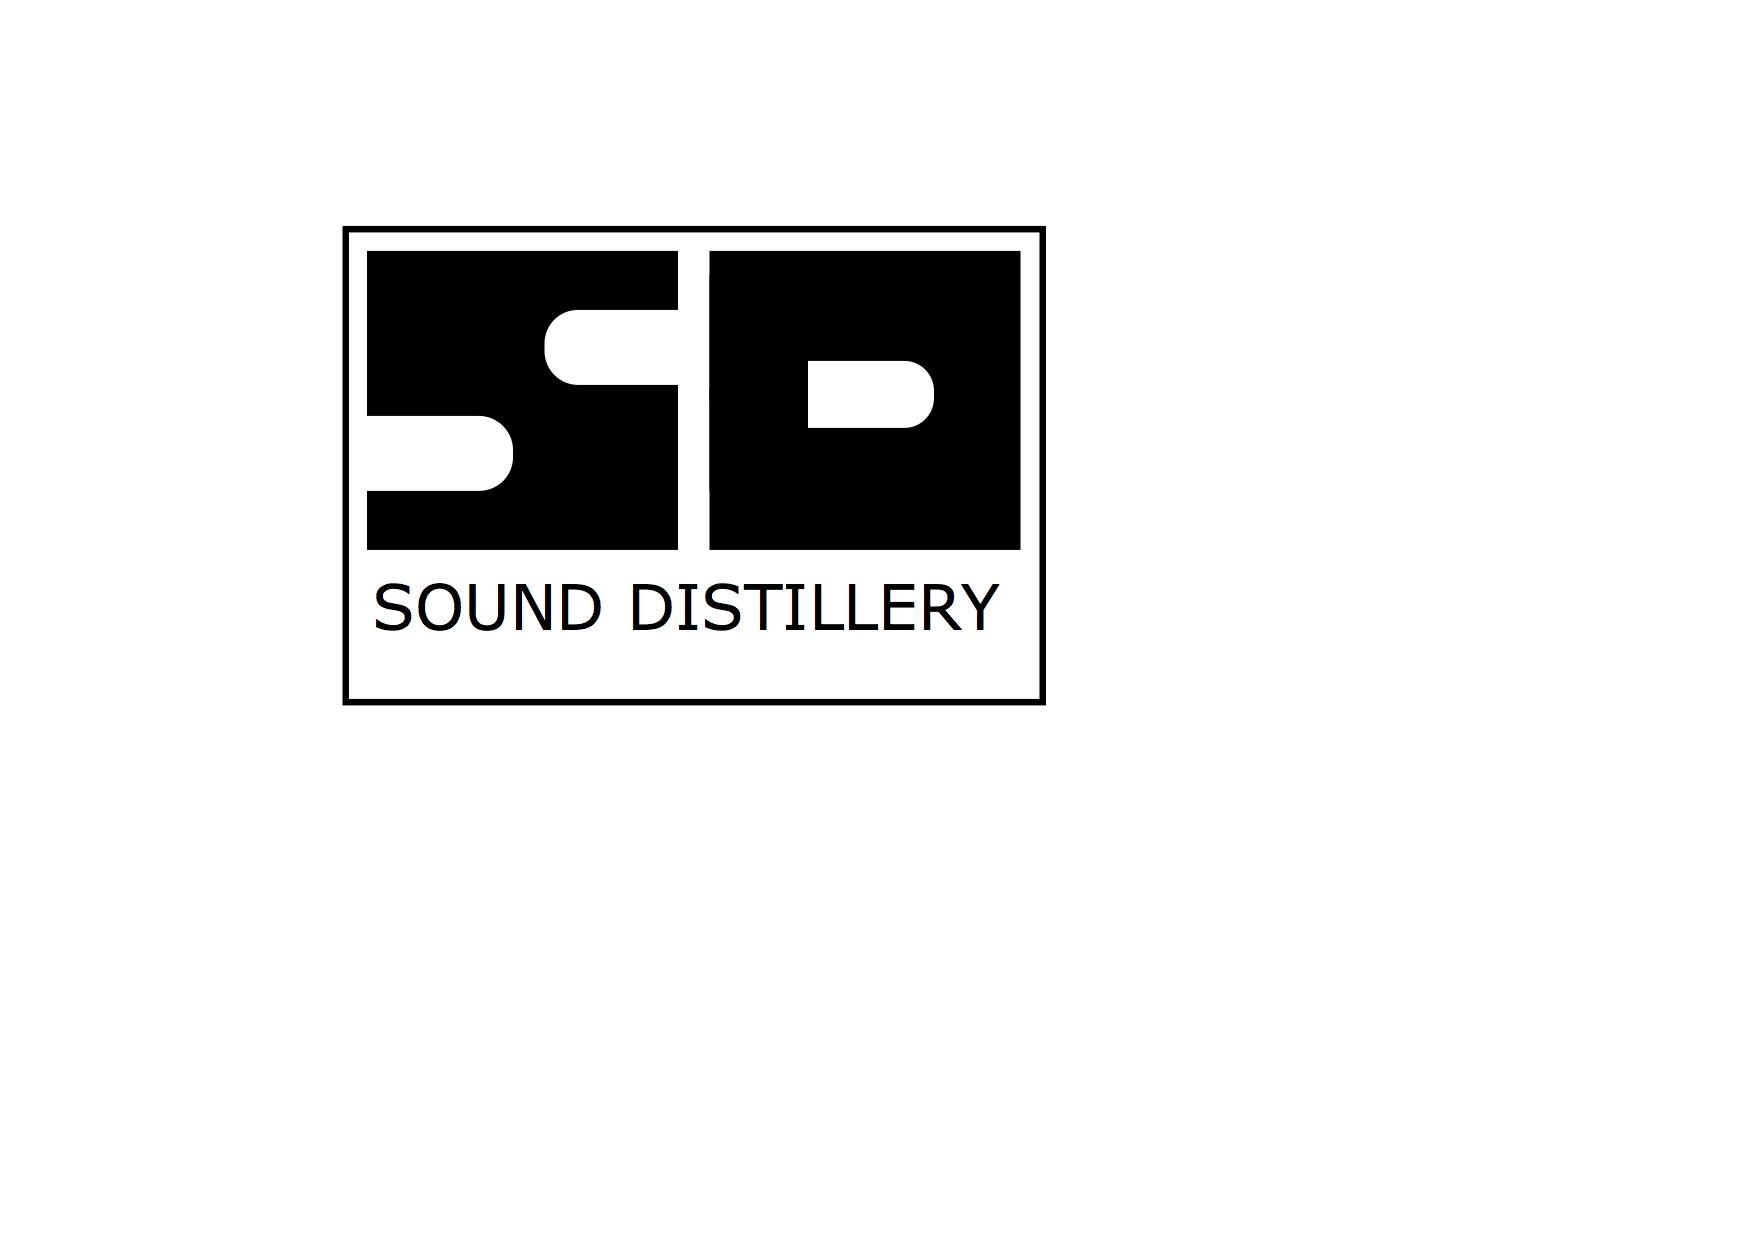 Sounddistillery